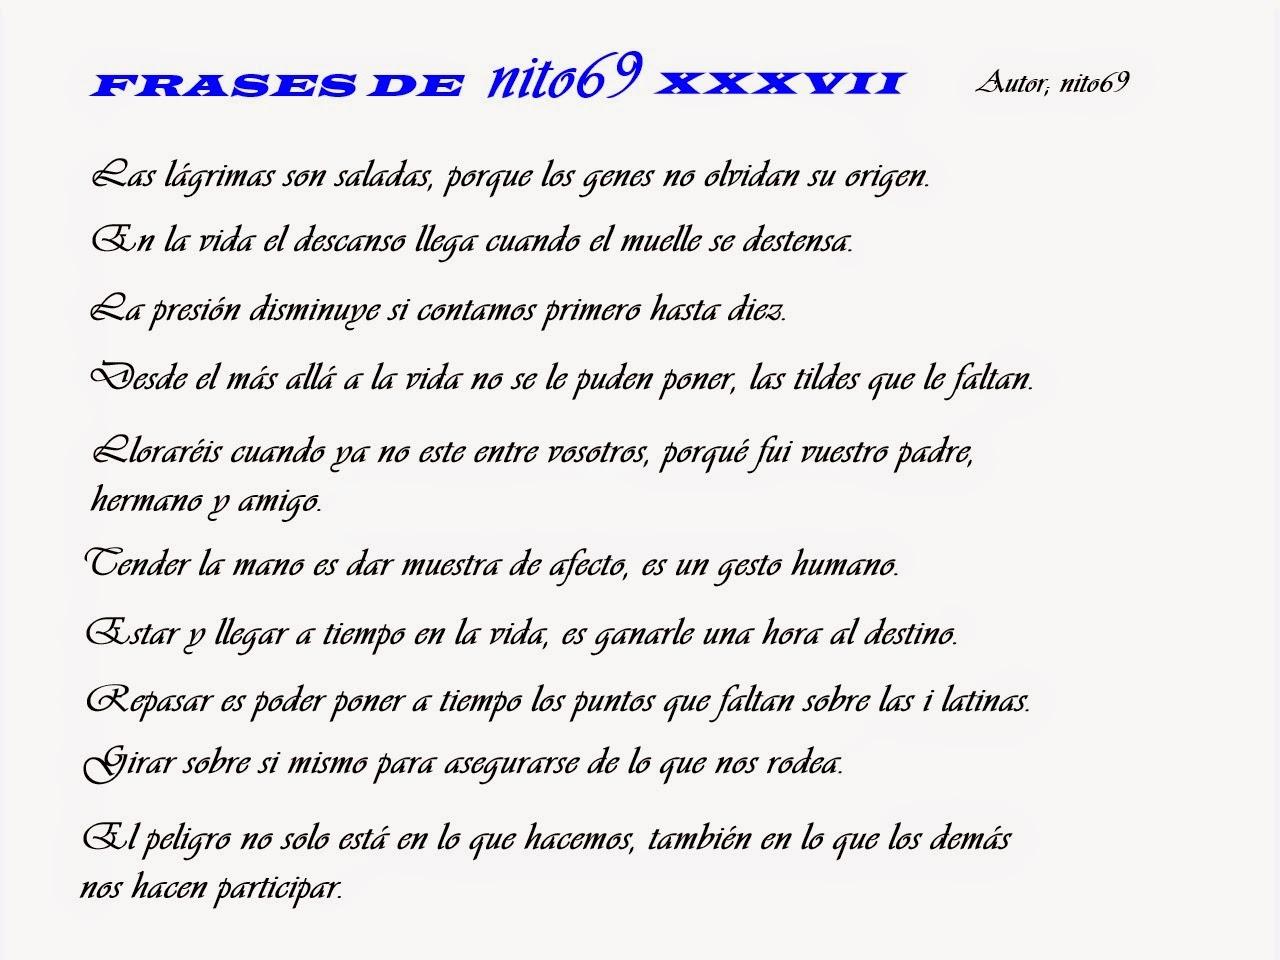 FRASES DE nito69 XXXVII